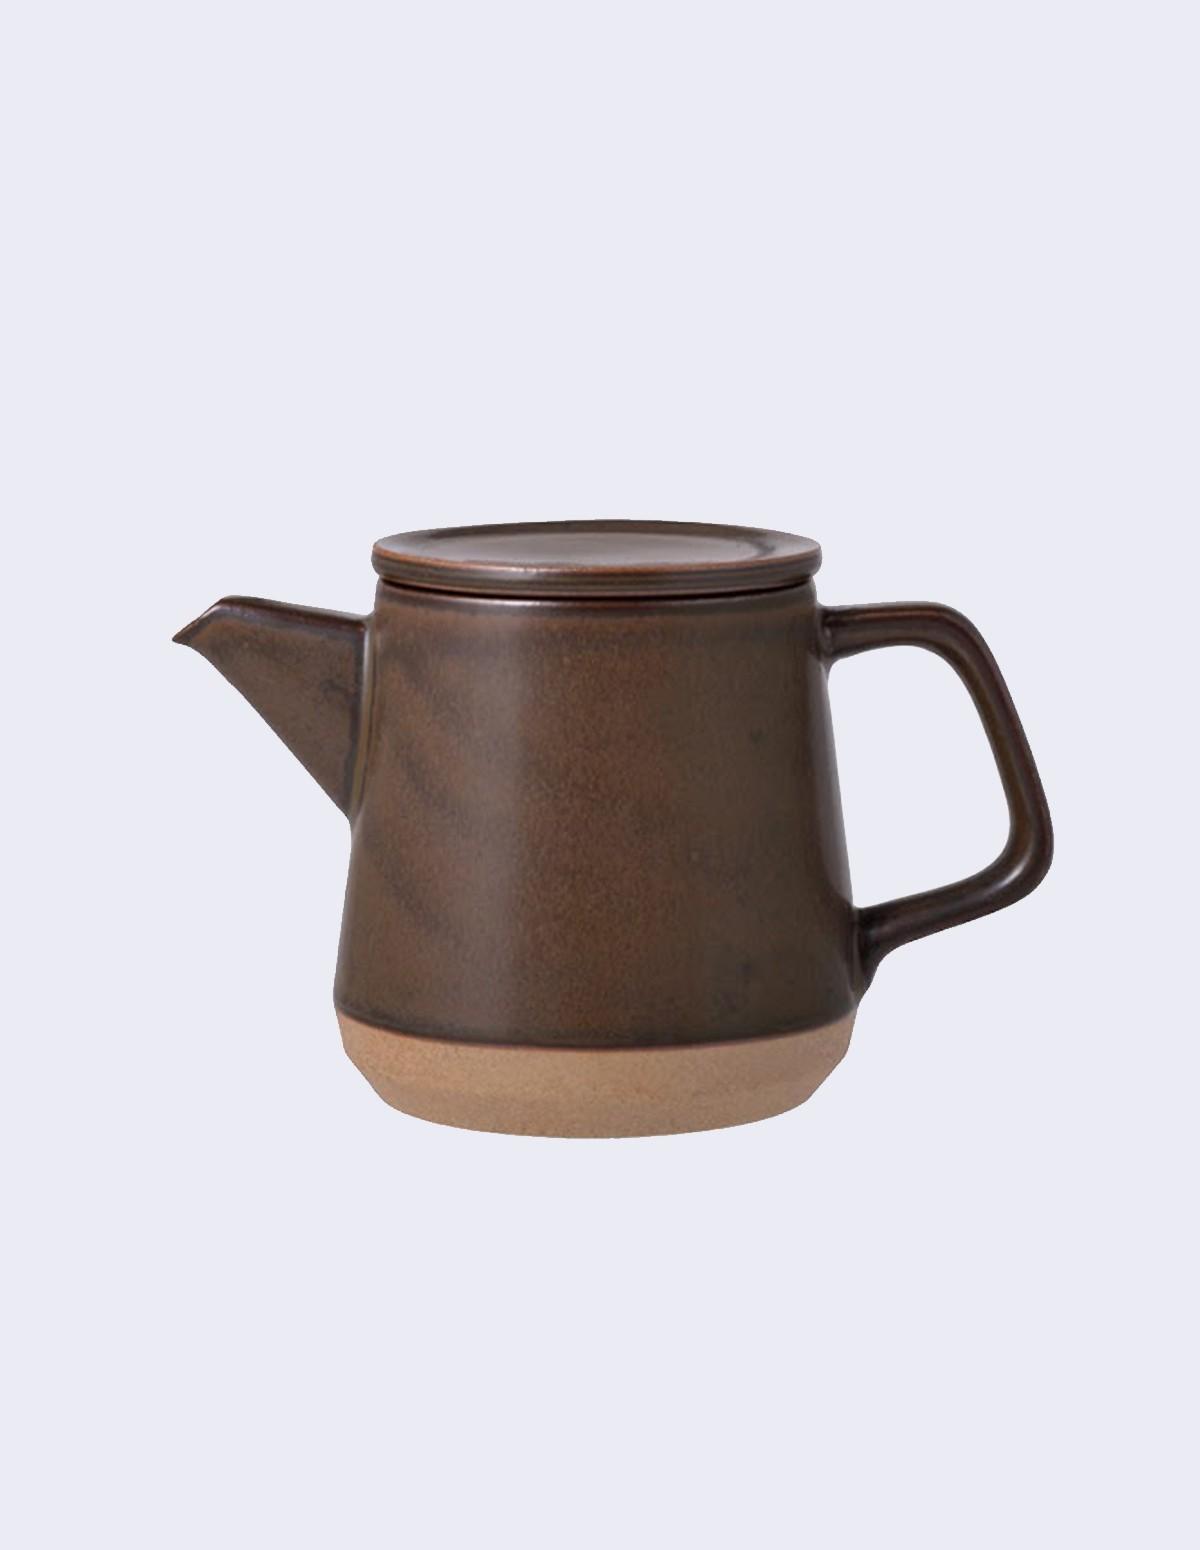 Clk 151 Teapot 500ml - BROWN